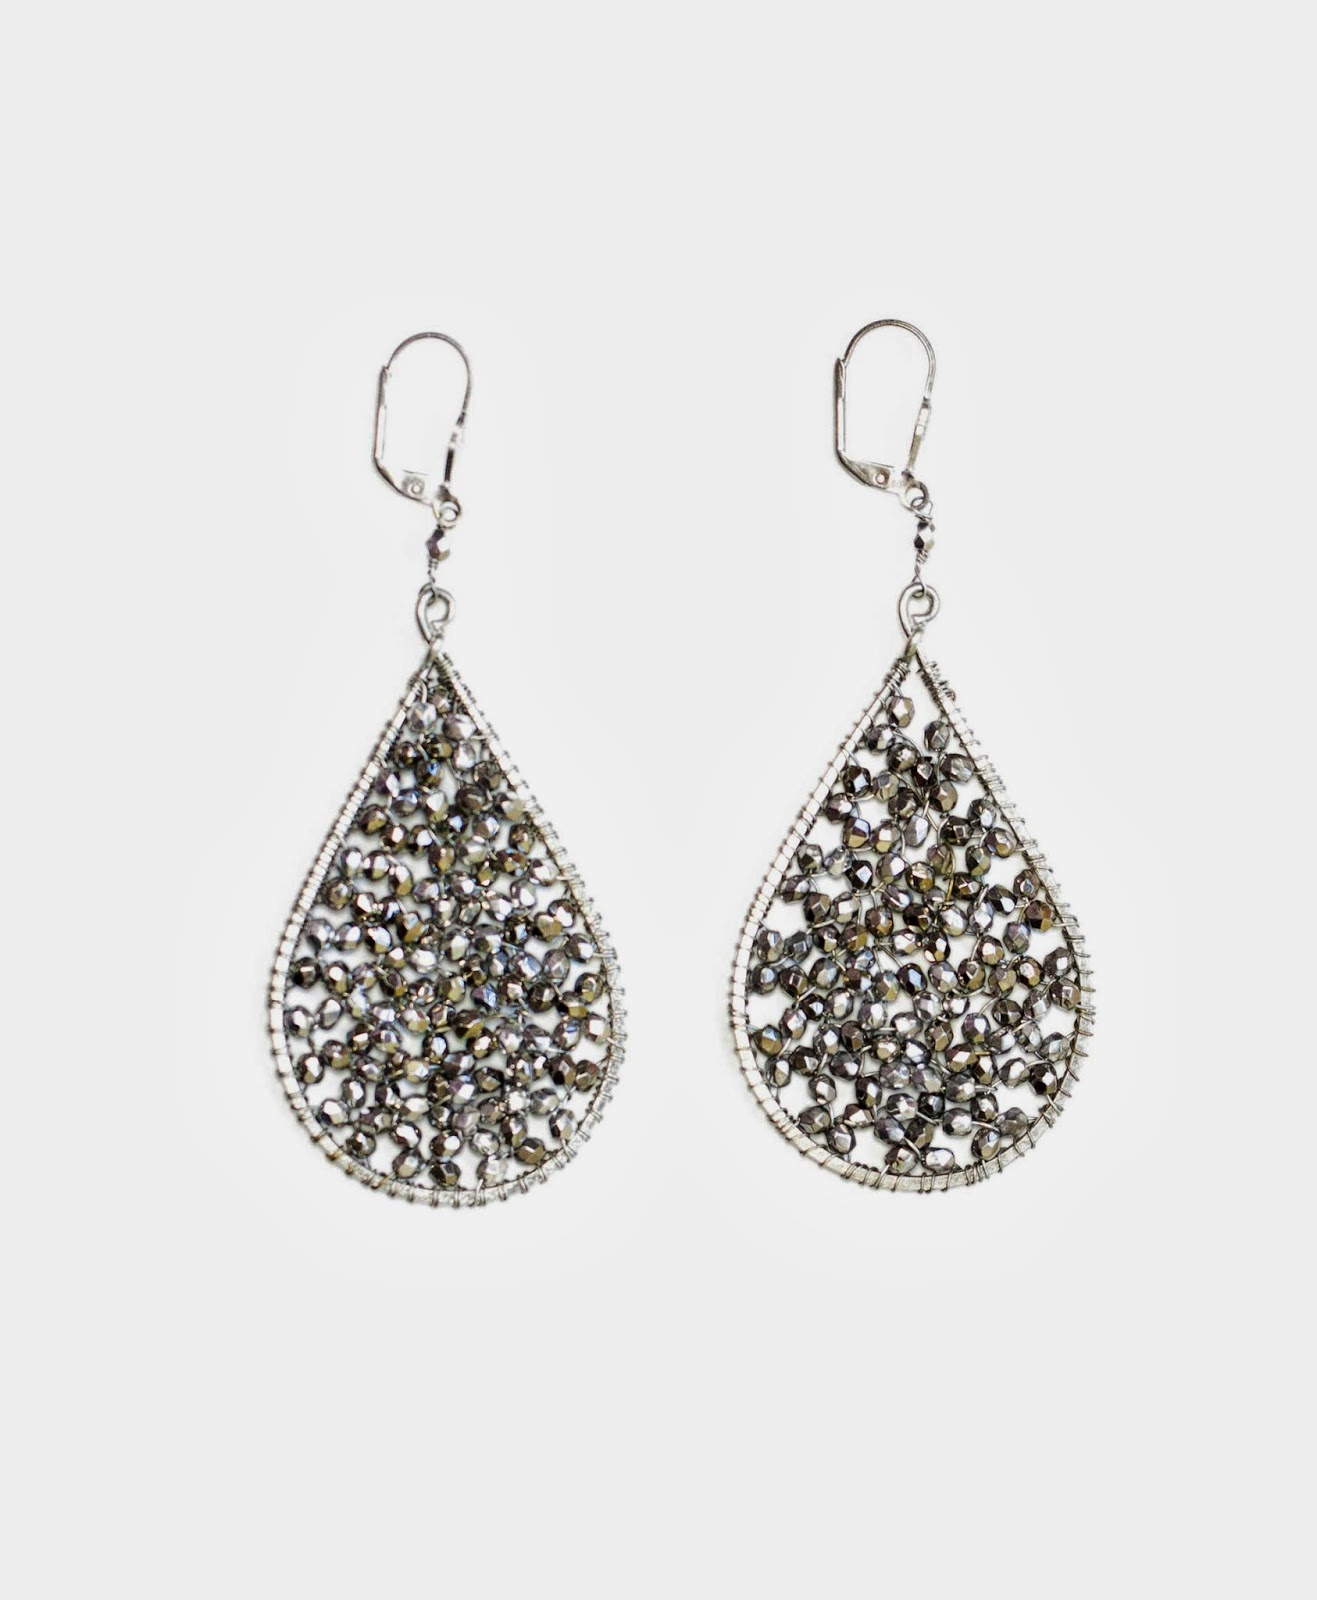 http://www.katemcnatt.noondaycollection.com/earrings/water-drop-prism-earrings